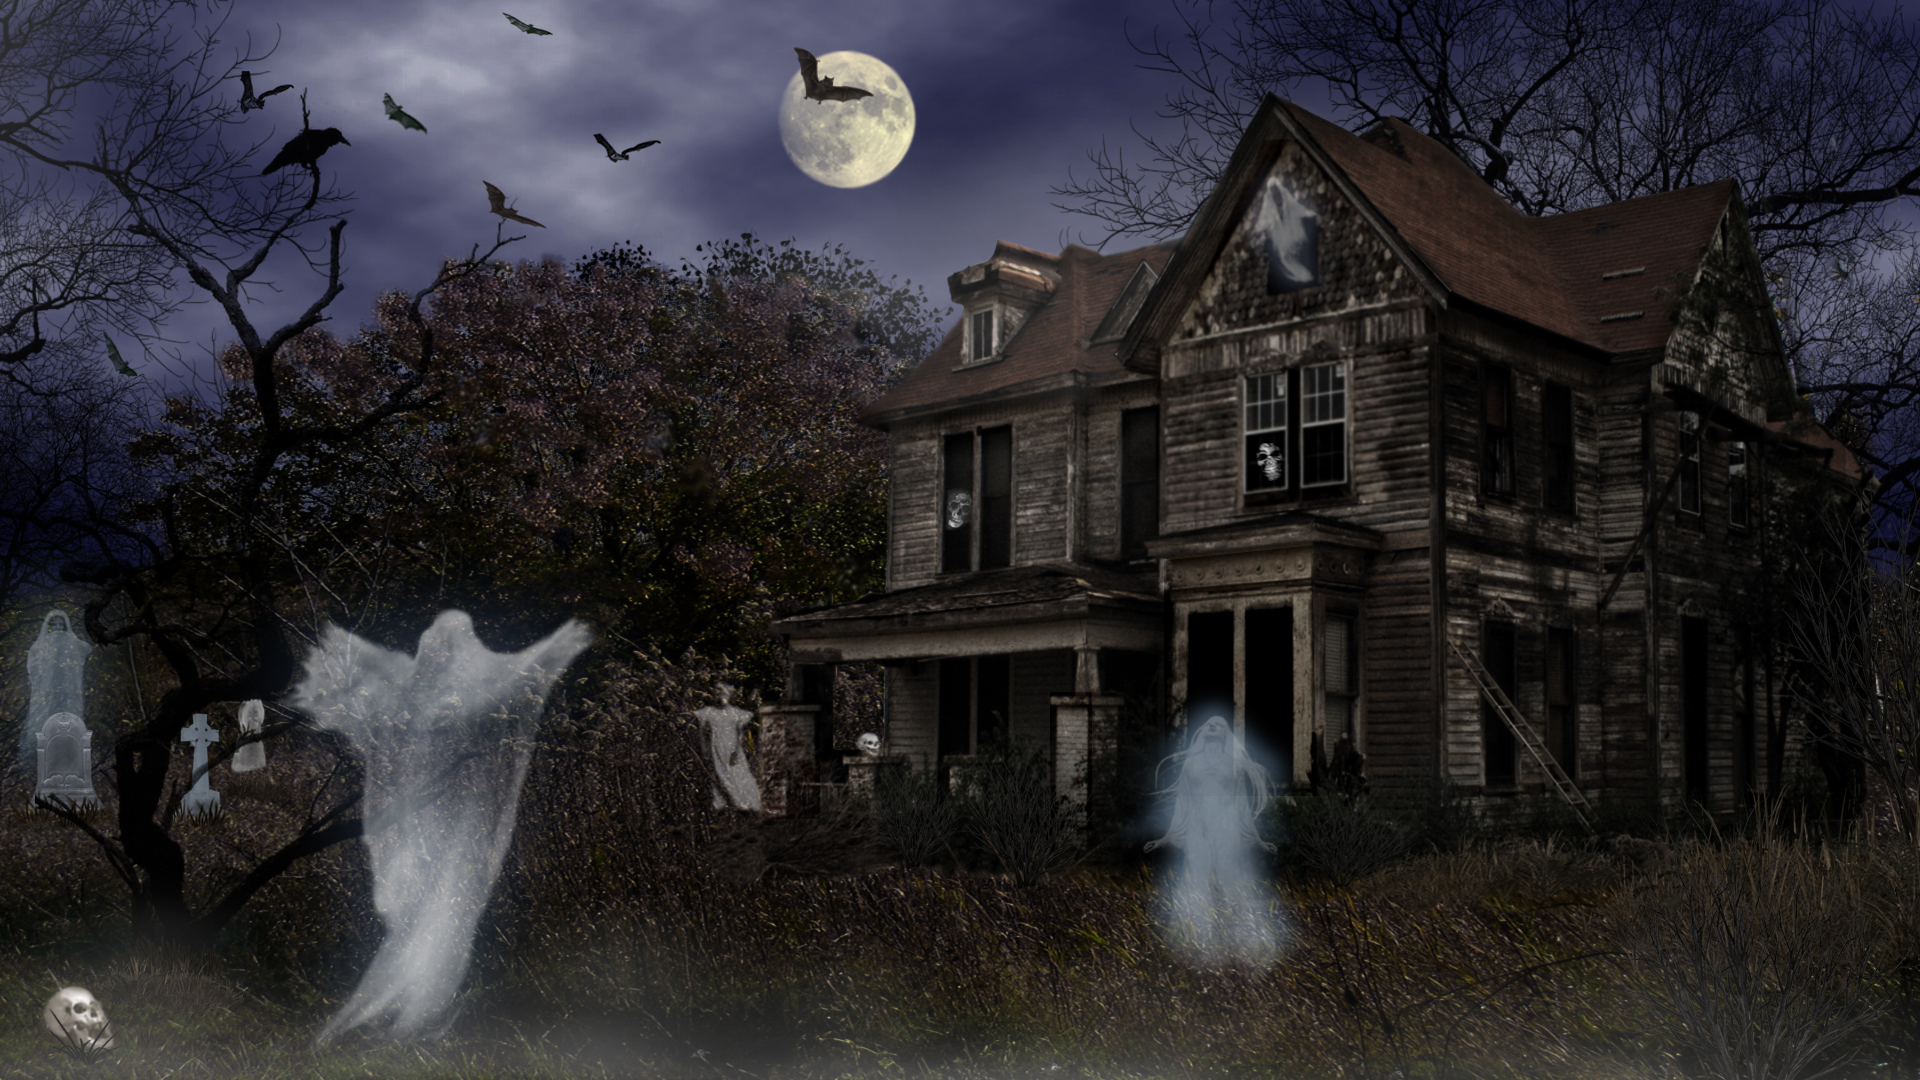 Halloween Haunted House Wallpapers 1920x1080